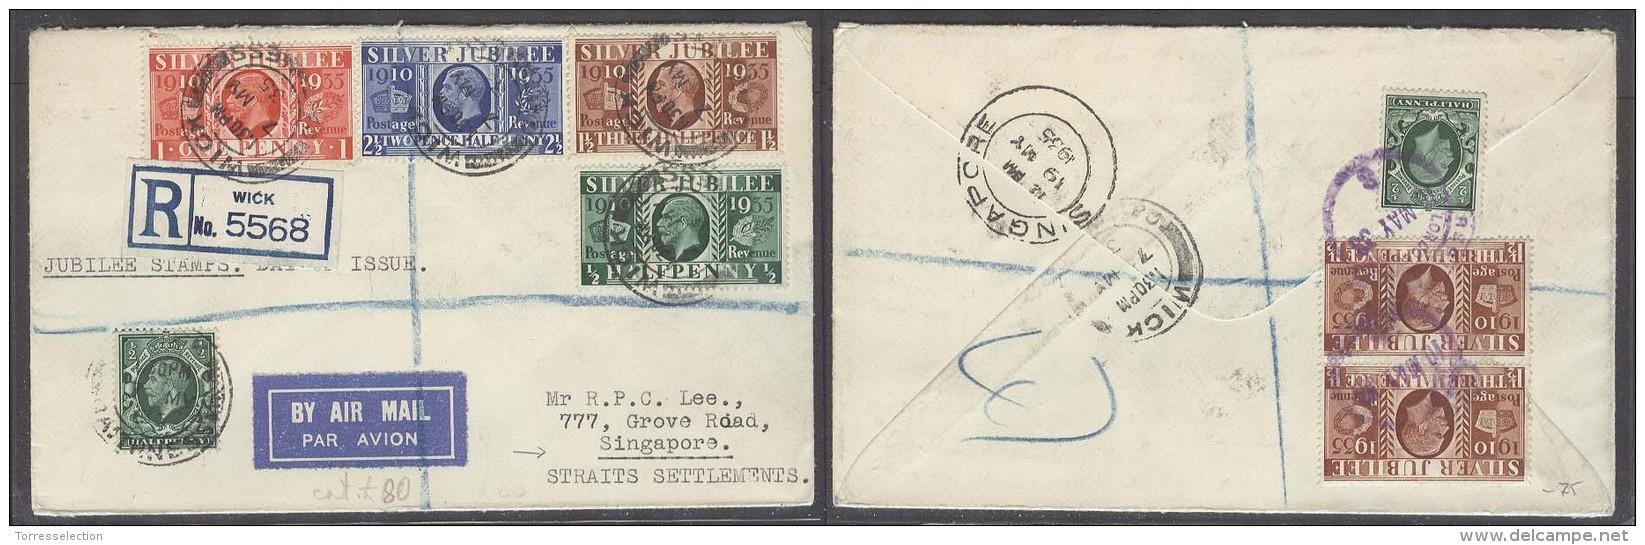 Great Britain - XX. 1935 (7 May). Wick - Singapore (19 May). Jubilee Rep Multifkd Airmail Env 9 1/2d Rate.. Carta, Co... - Great Britain